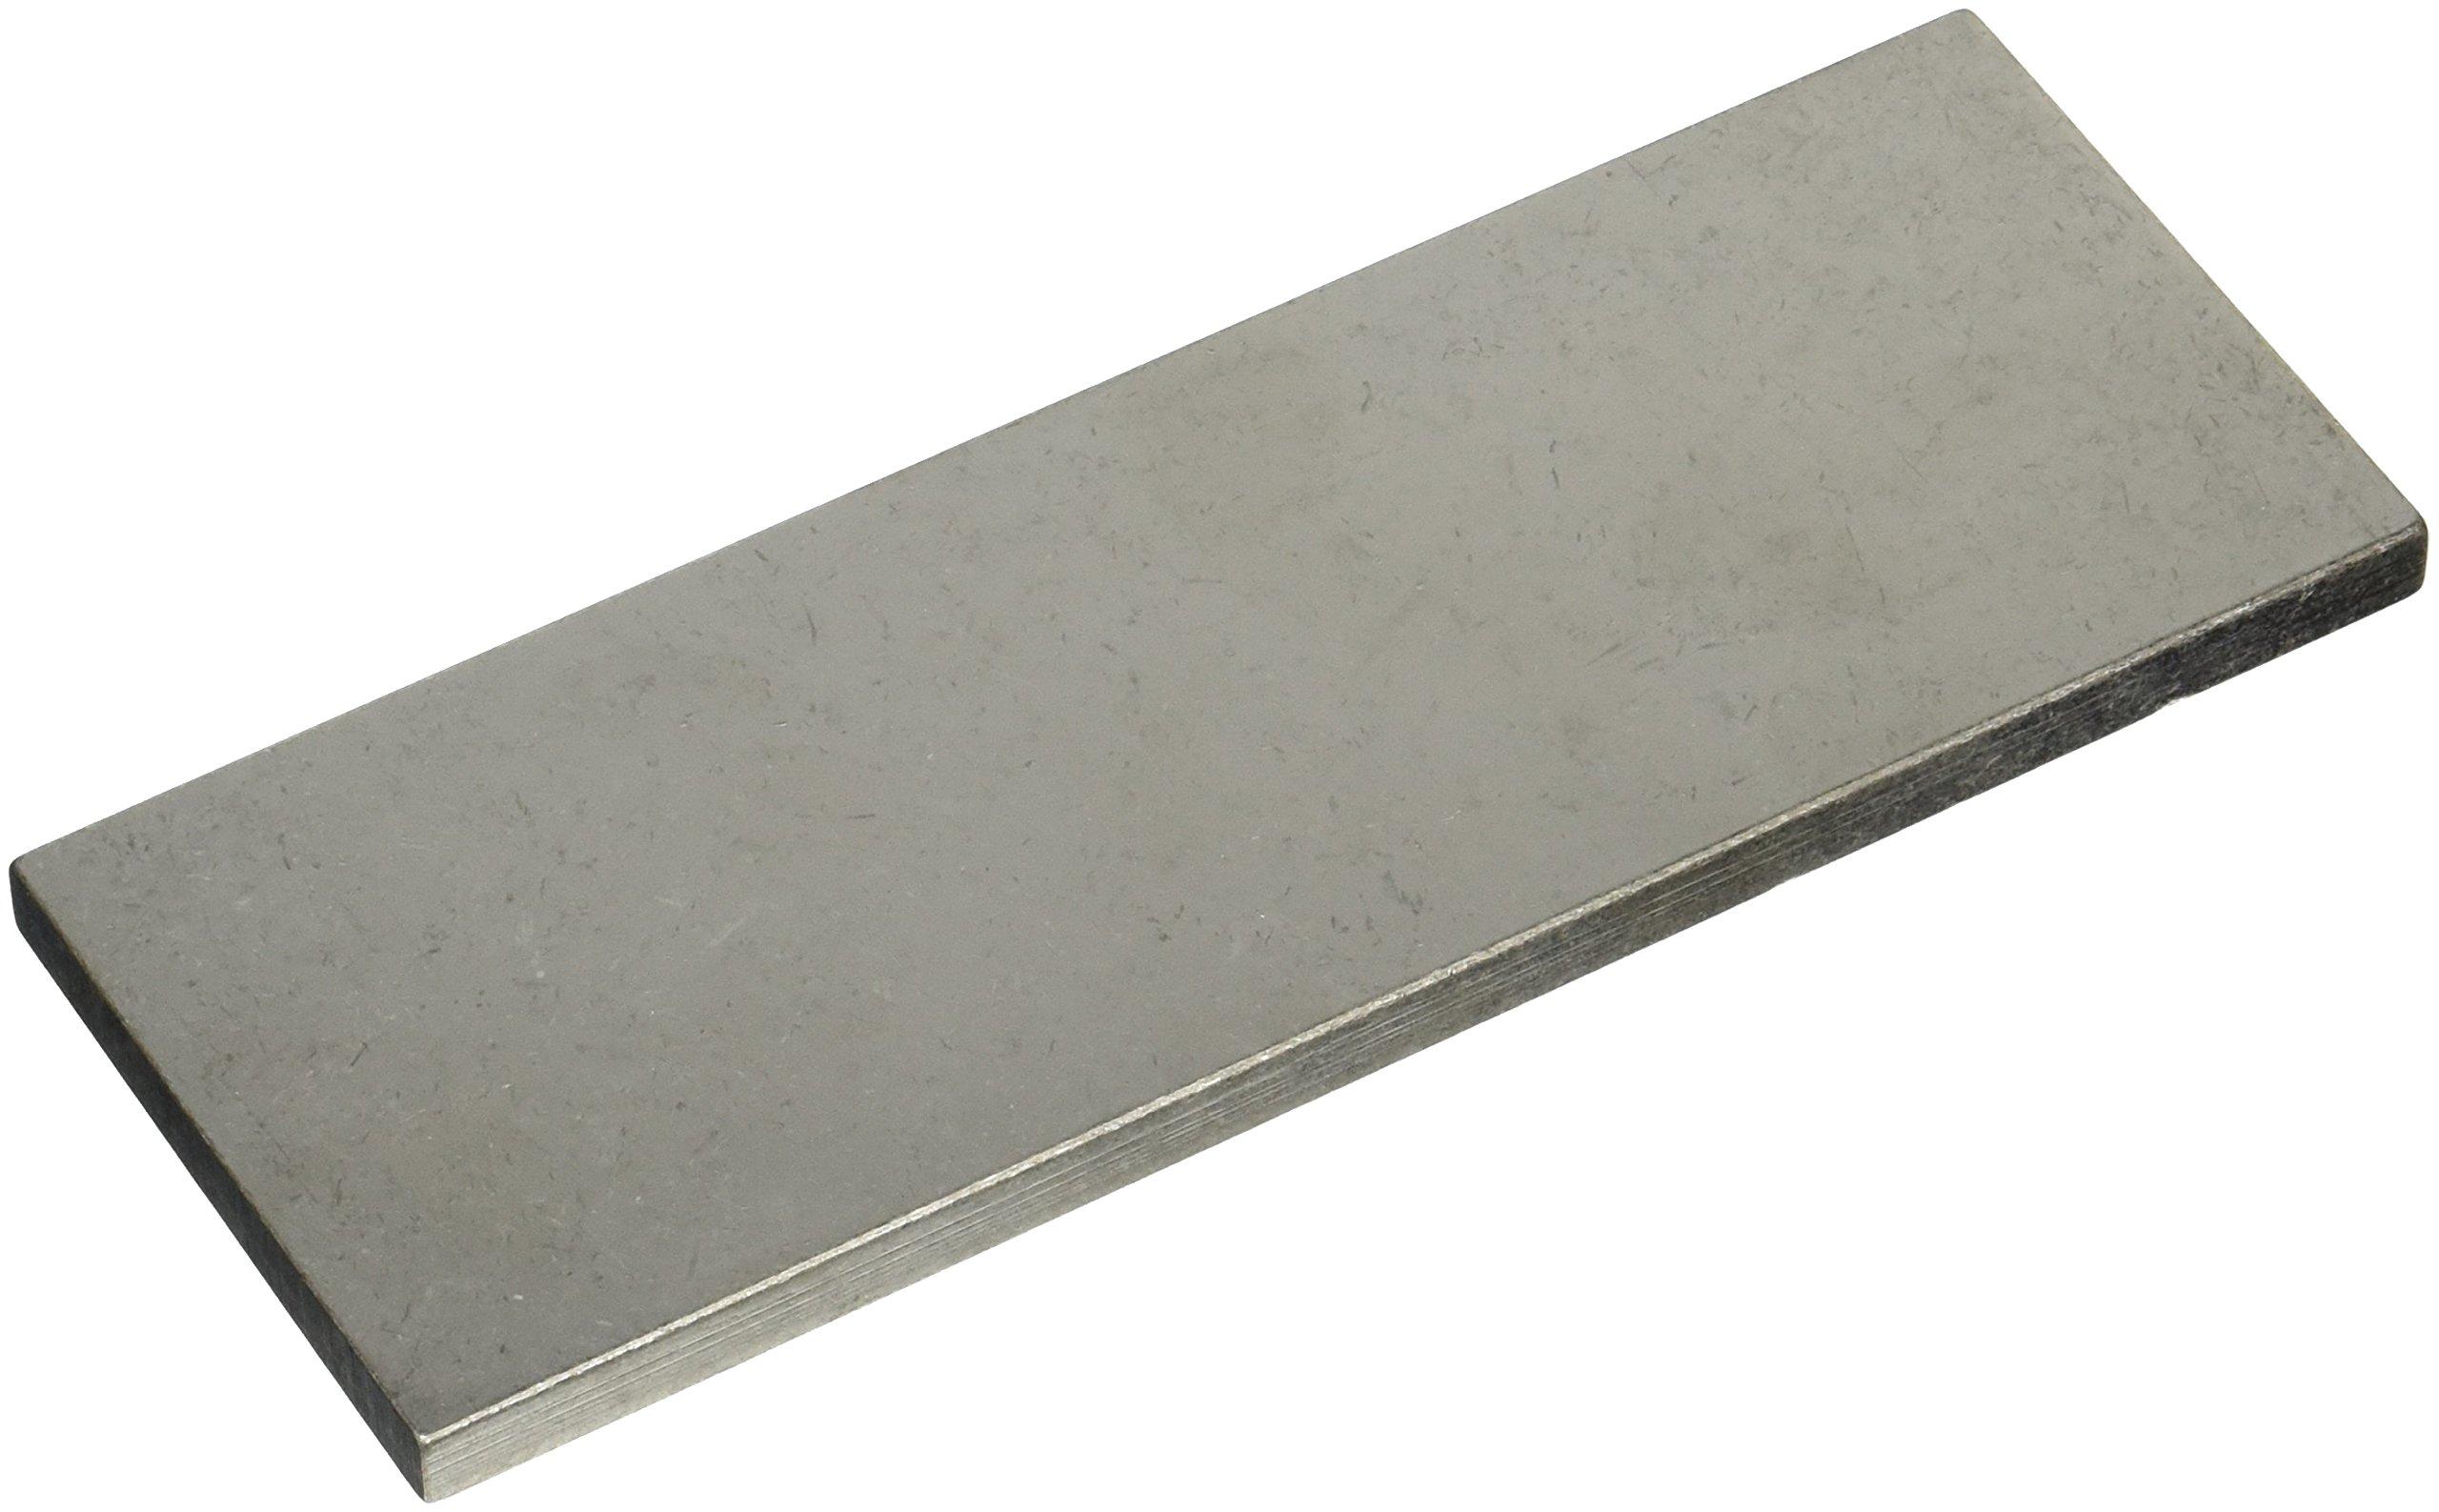 Dmt D8Me MediumExtraFine DiaSharp Bench Stone, 8'' by DMT (Diamond Machine Technology) (Image #1)